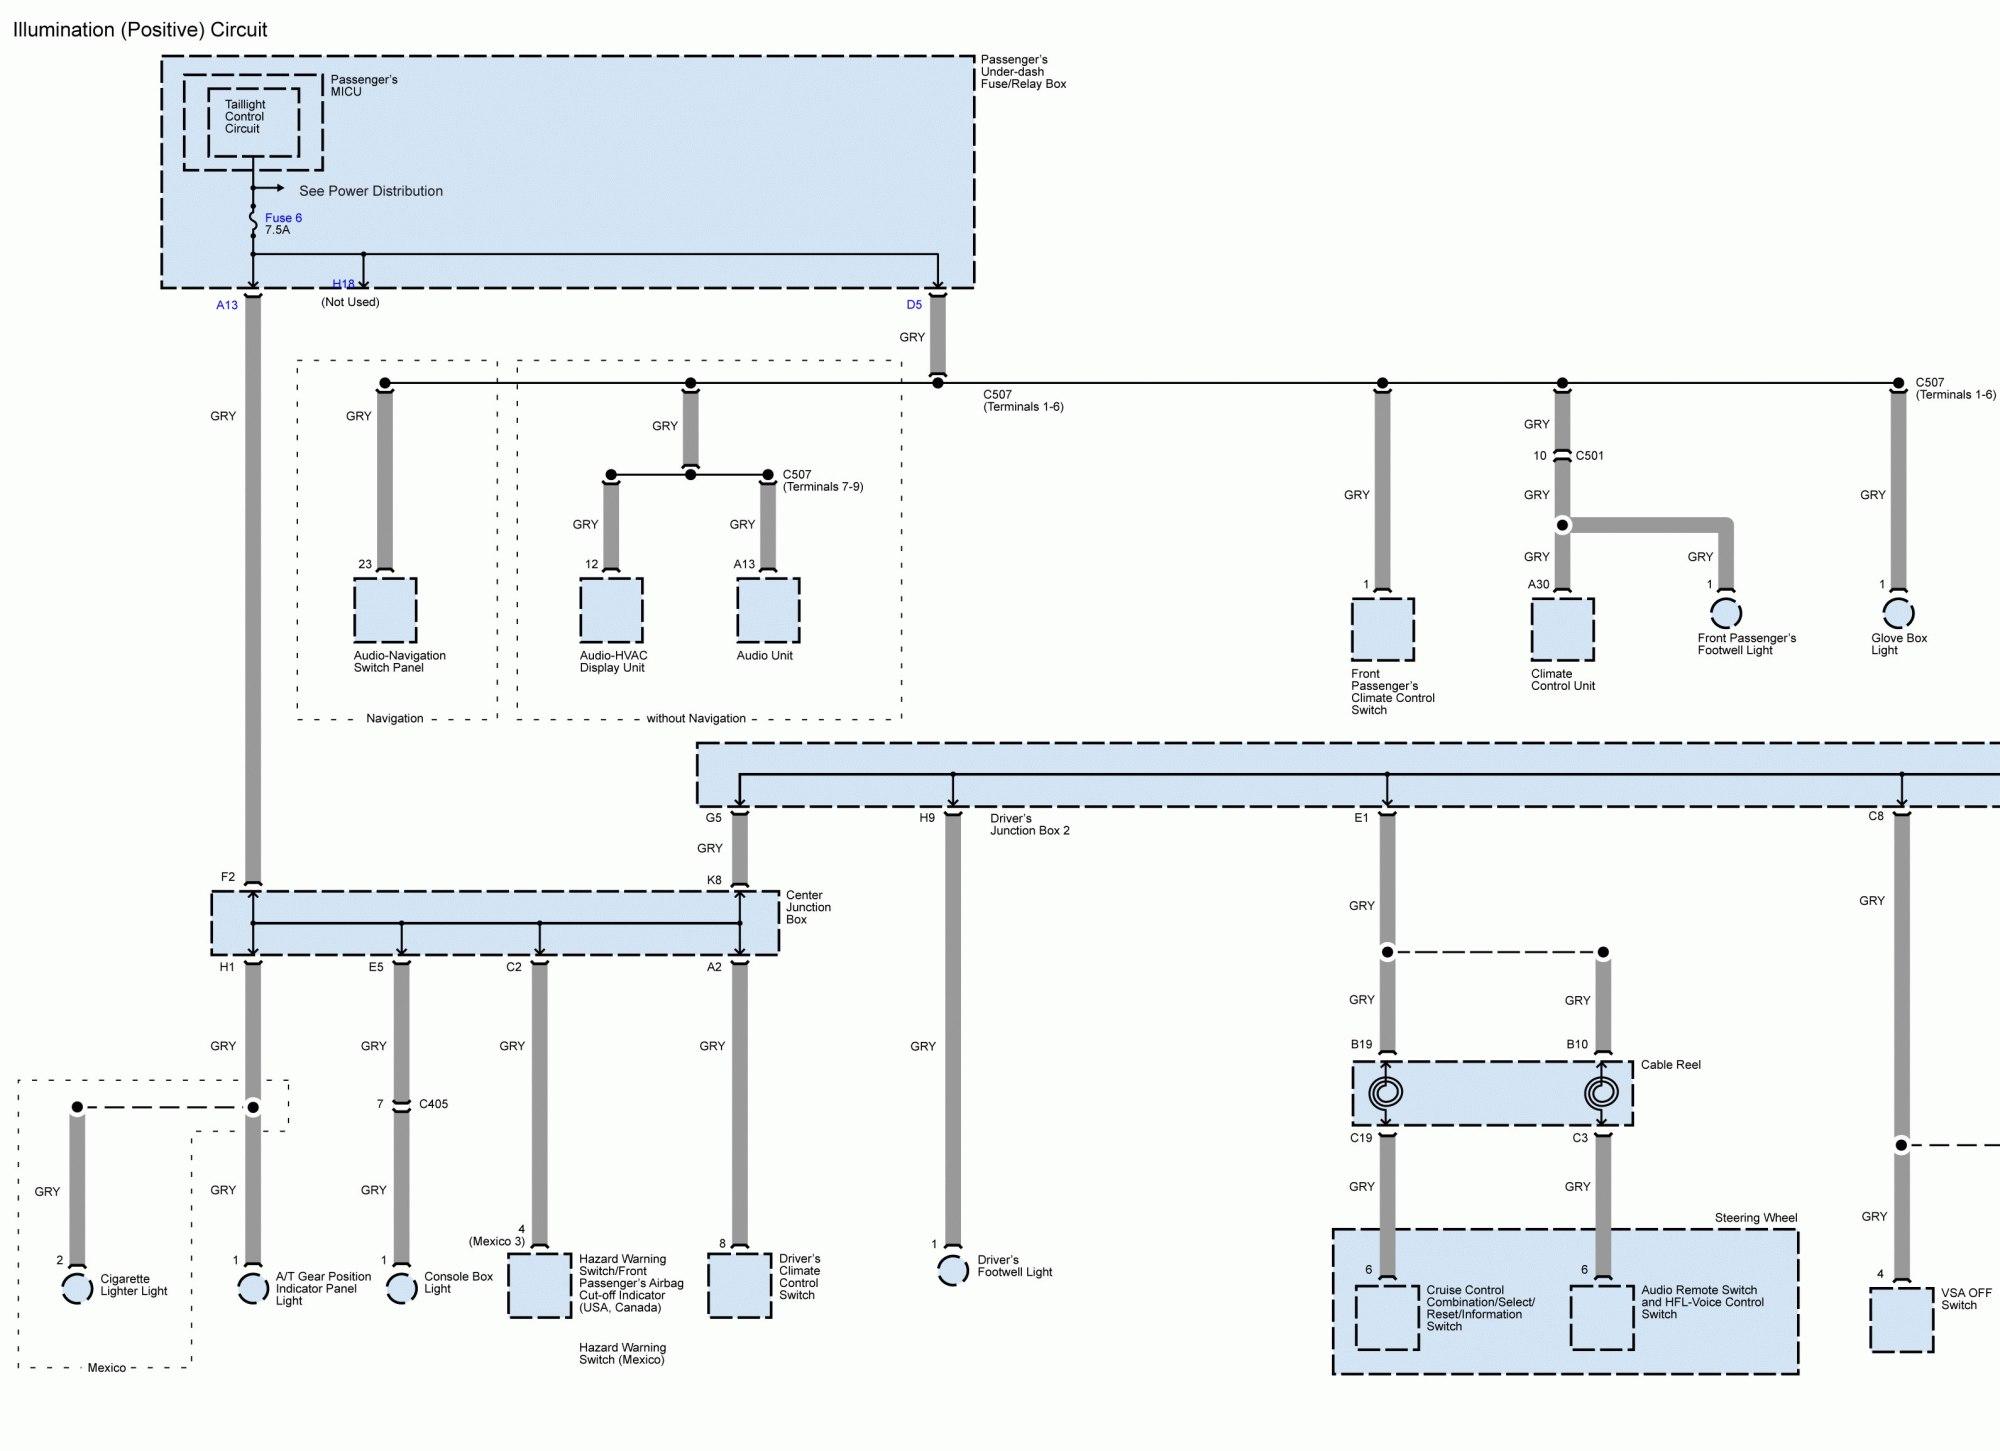 hight resolution of acura tl wiring diagram splice illumination positive circuit part 1